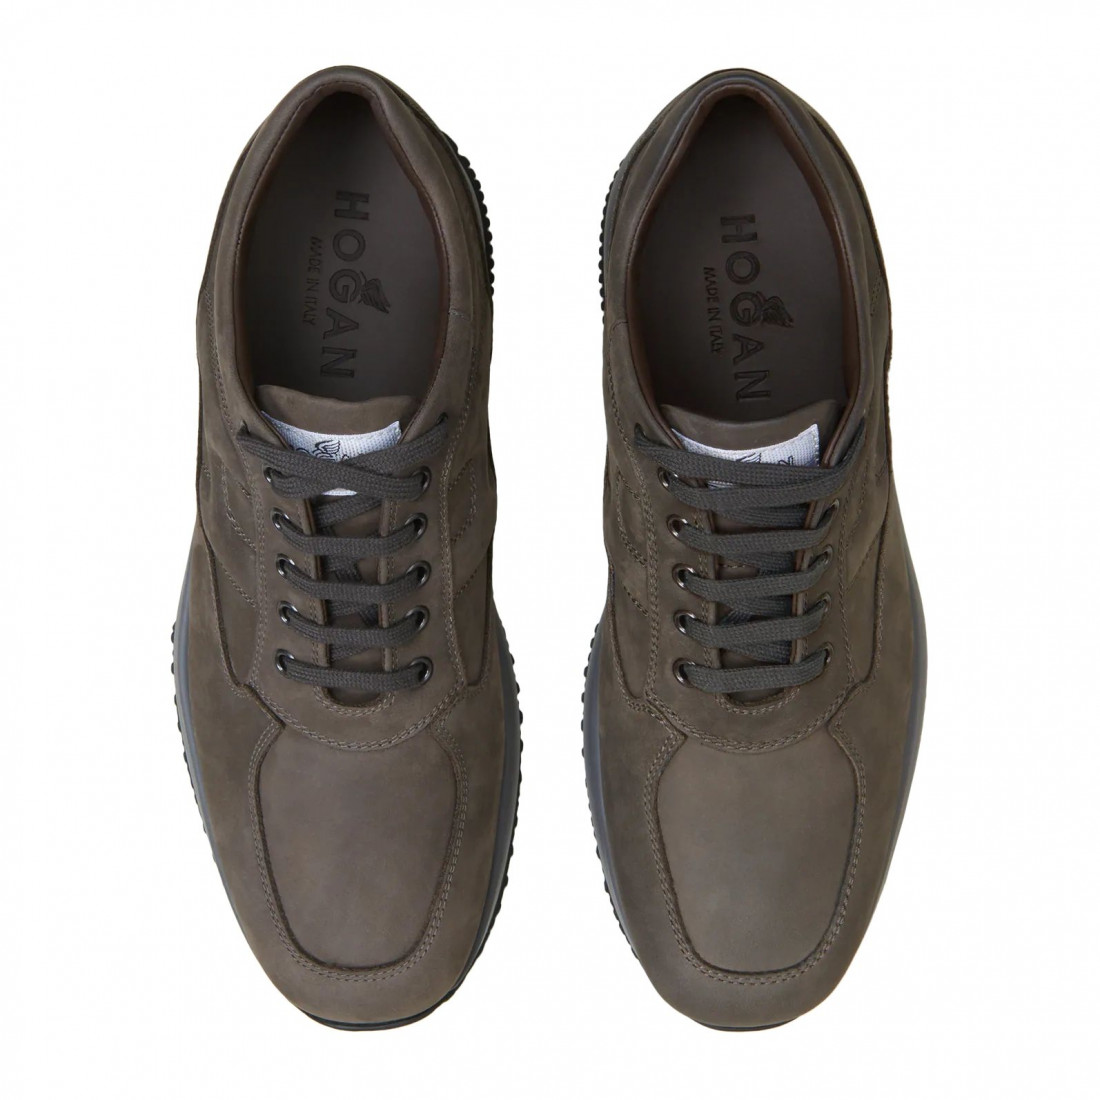 sneakers uomo hogan hxm00n00010dscb611 3435